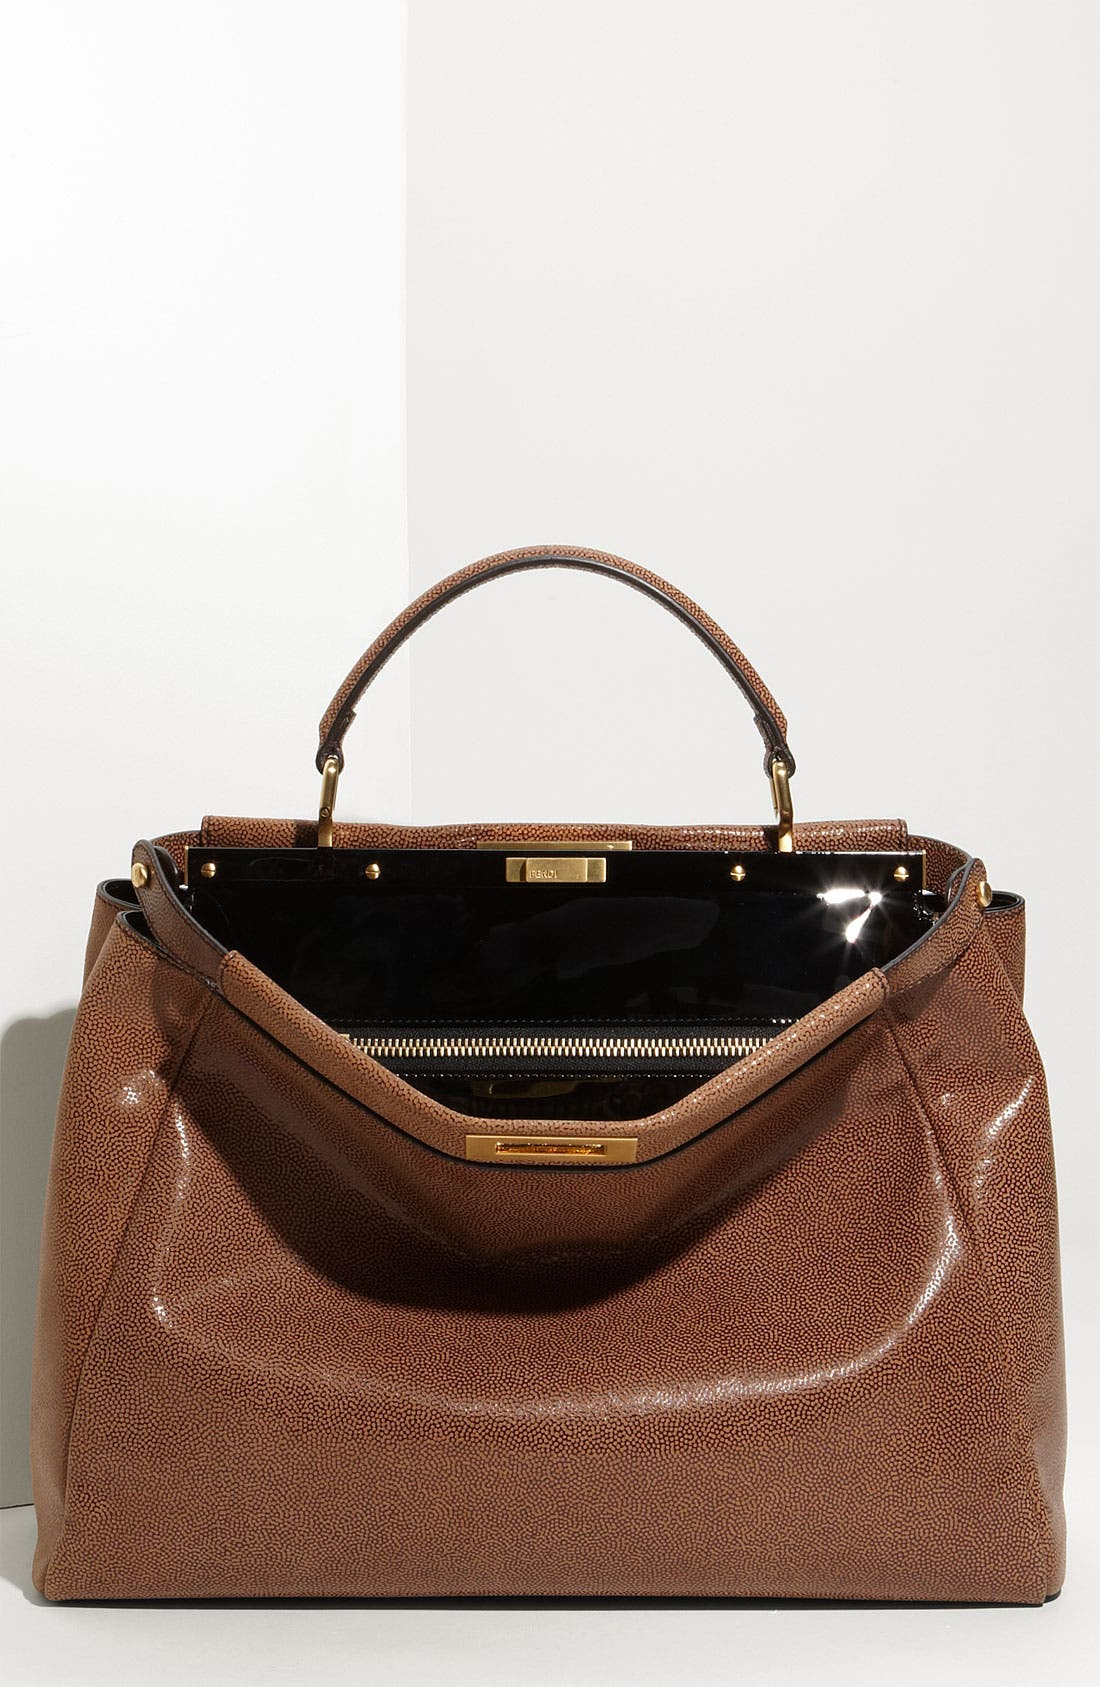 Alternate Image 1 Selected - Fendi 'Peekaboo - Large' Glazed Leather Satchel